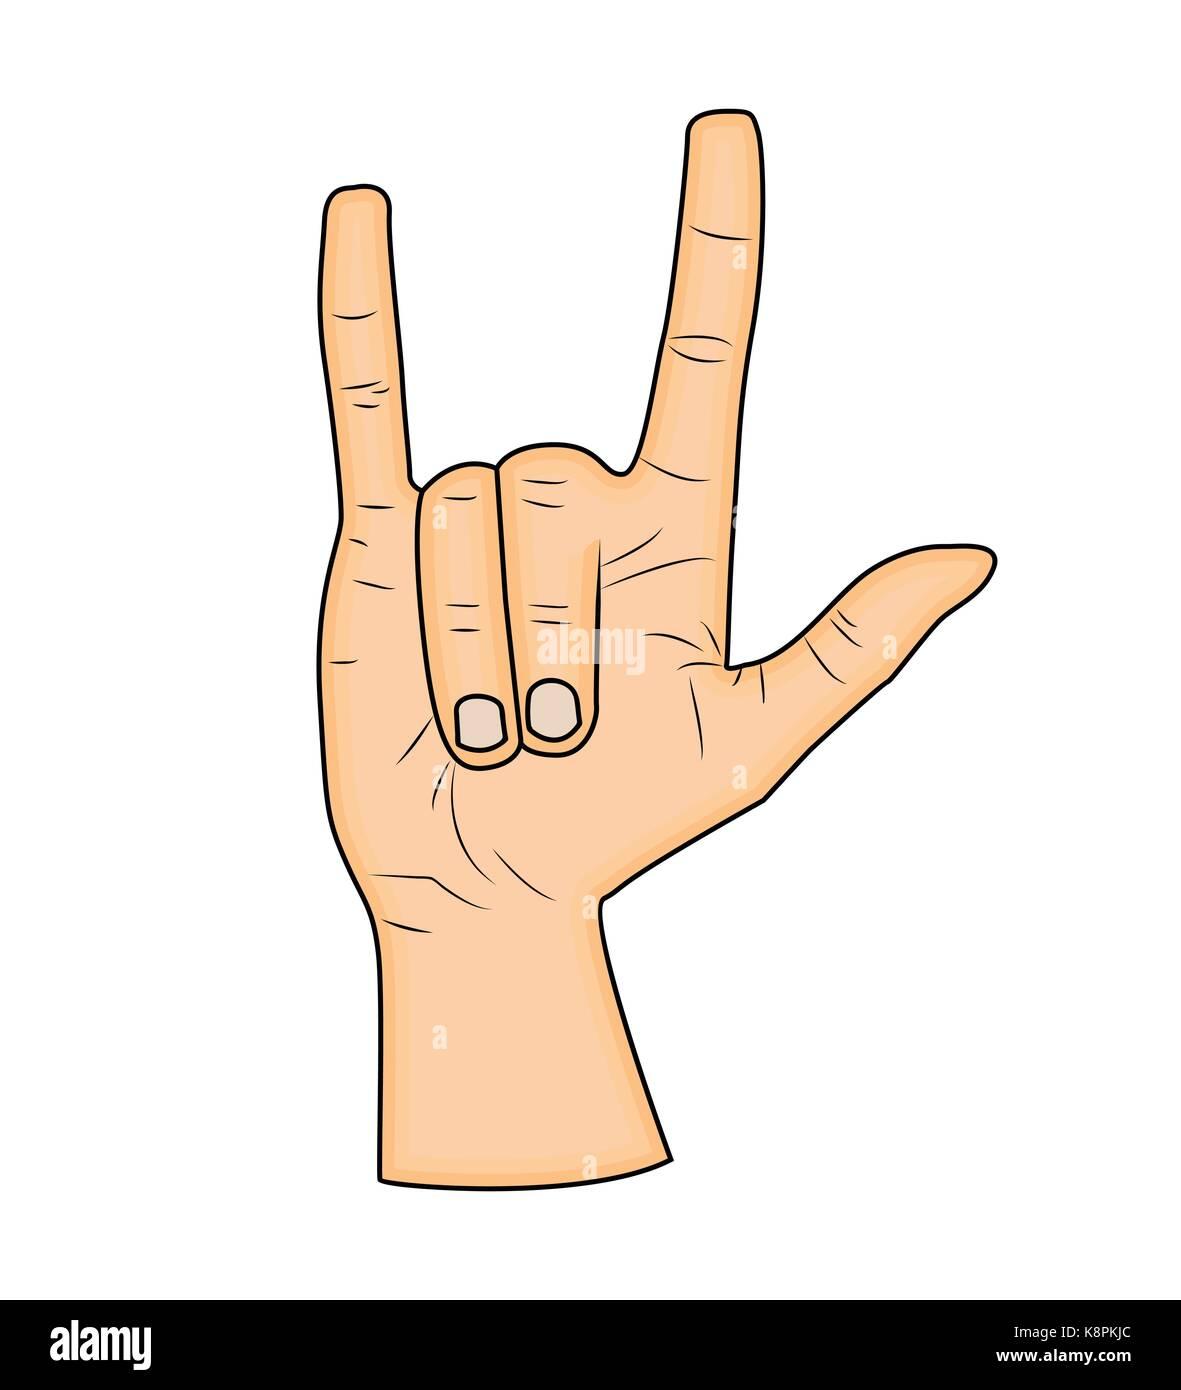 Horns hand satan sign finger up gesture vector isolated on white horns hand satan sign finger up gesture vector isolated on white background realistic cartoon illustration biocorpaavc Gallery